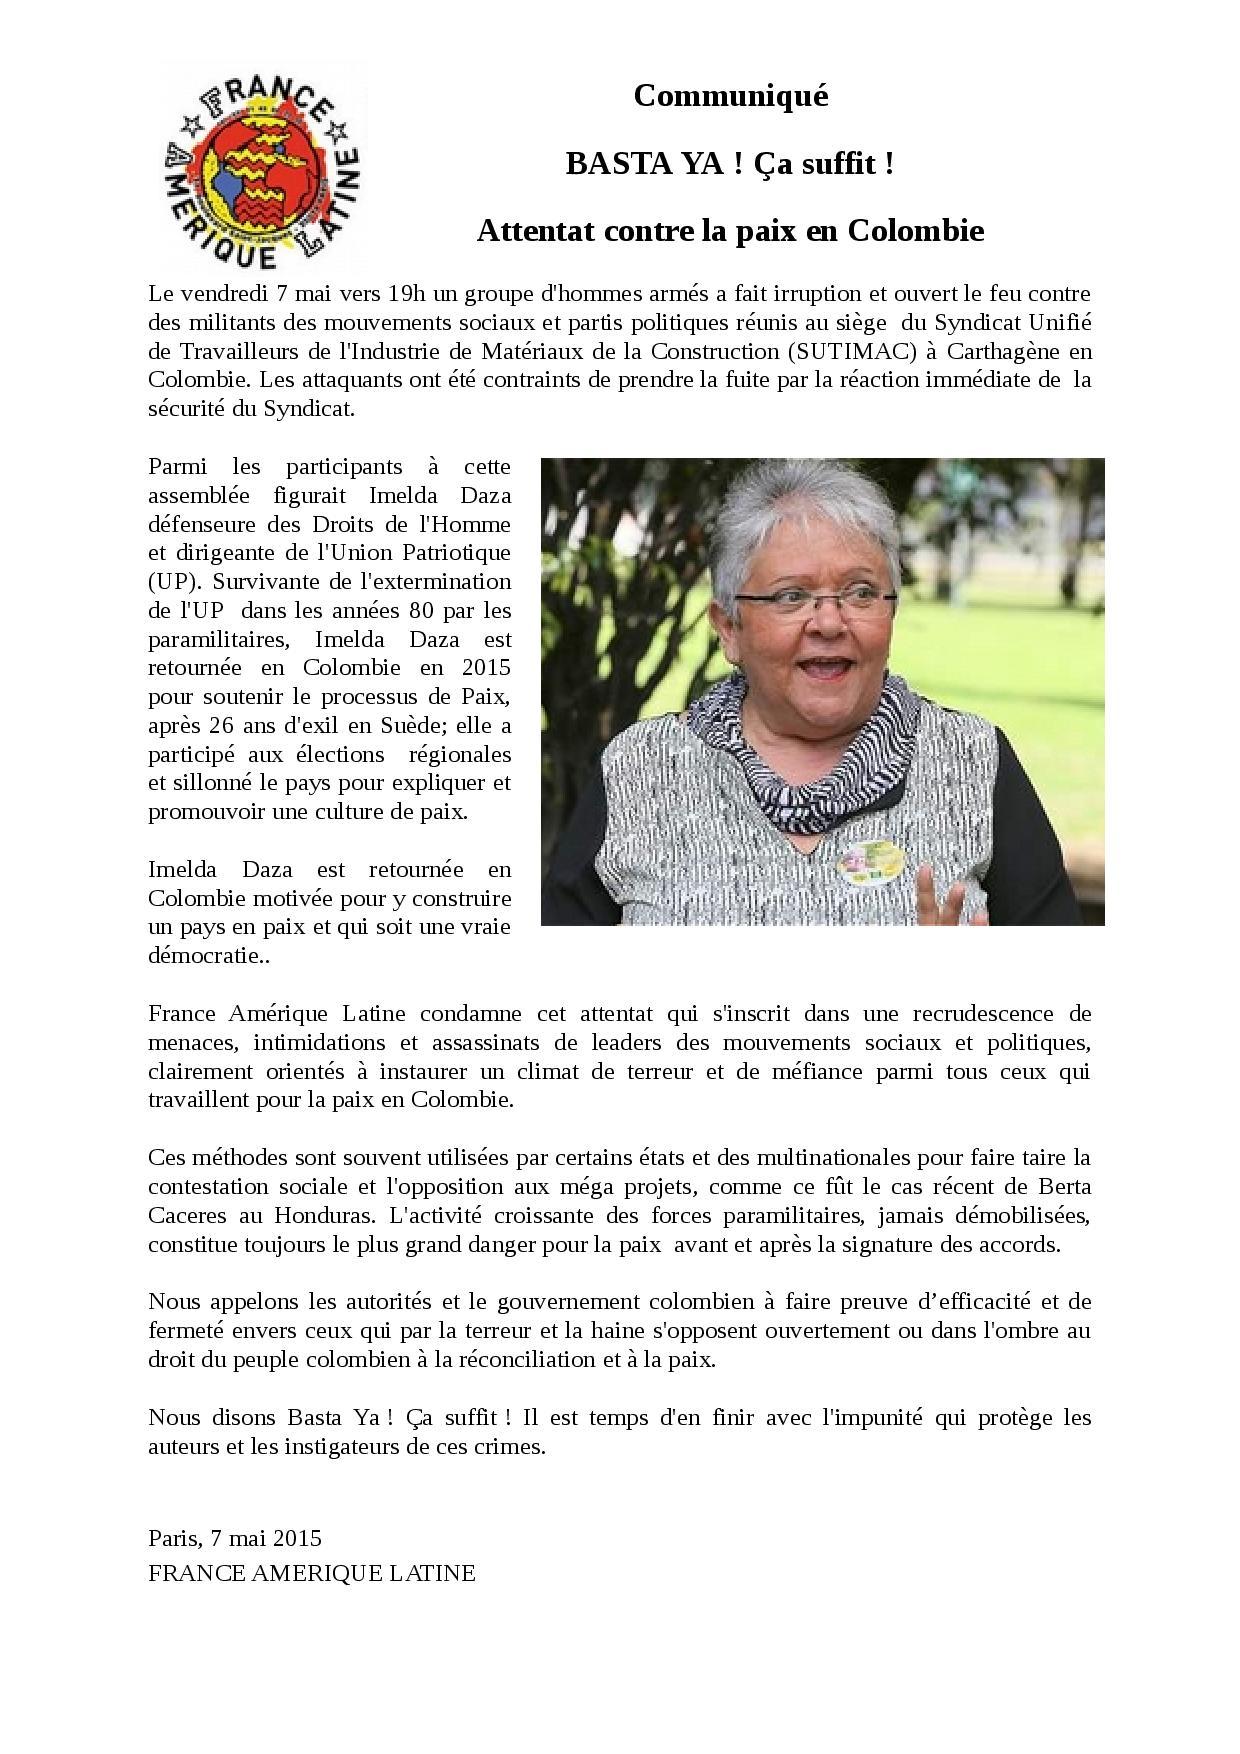 Communiqué FAL_Imelda-Daza_Colombie_FR-page-001